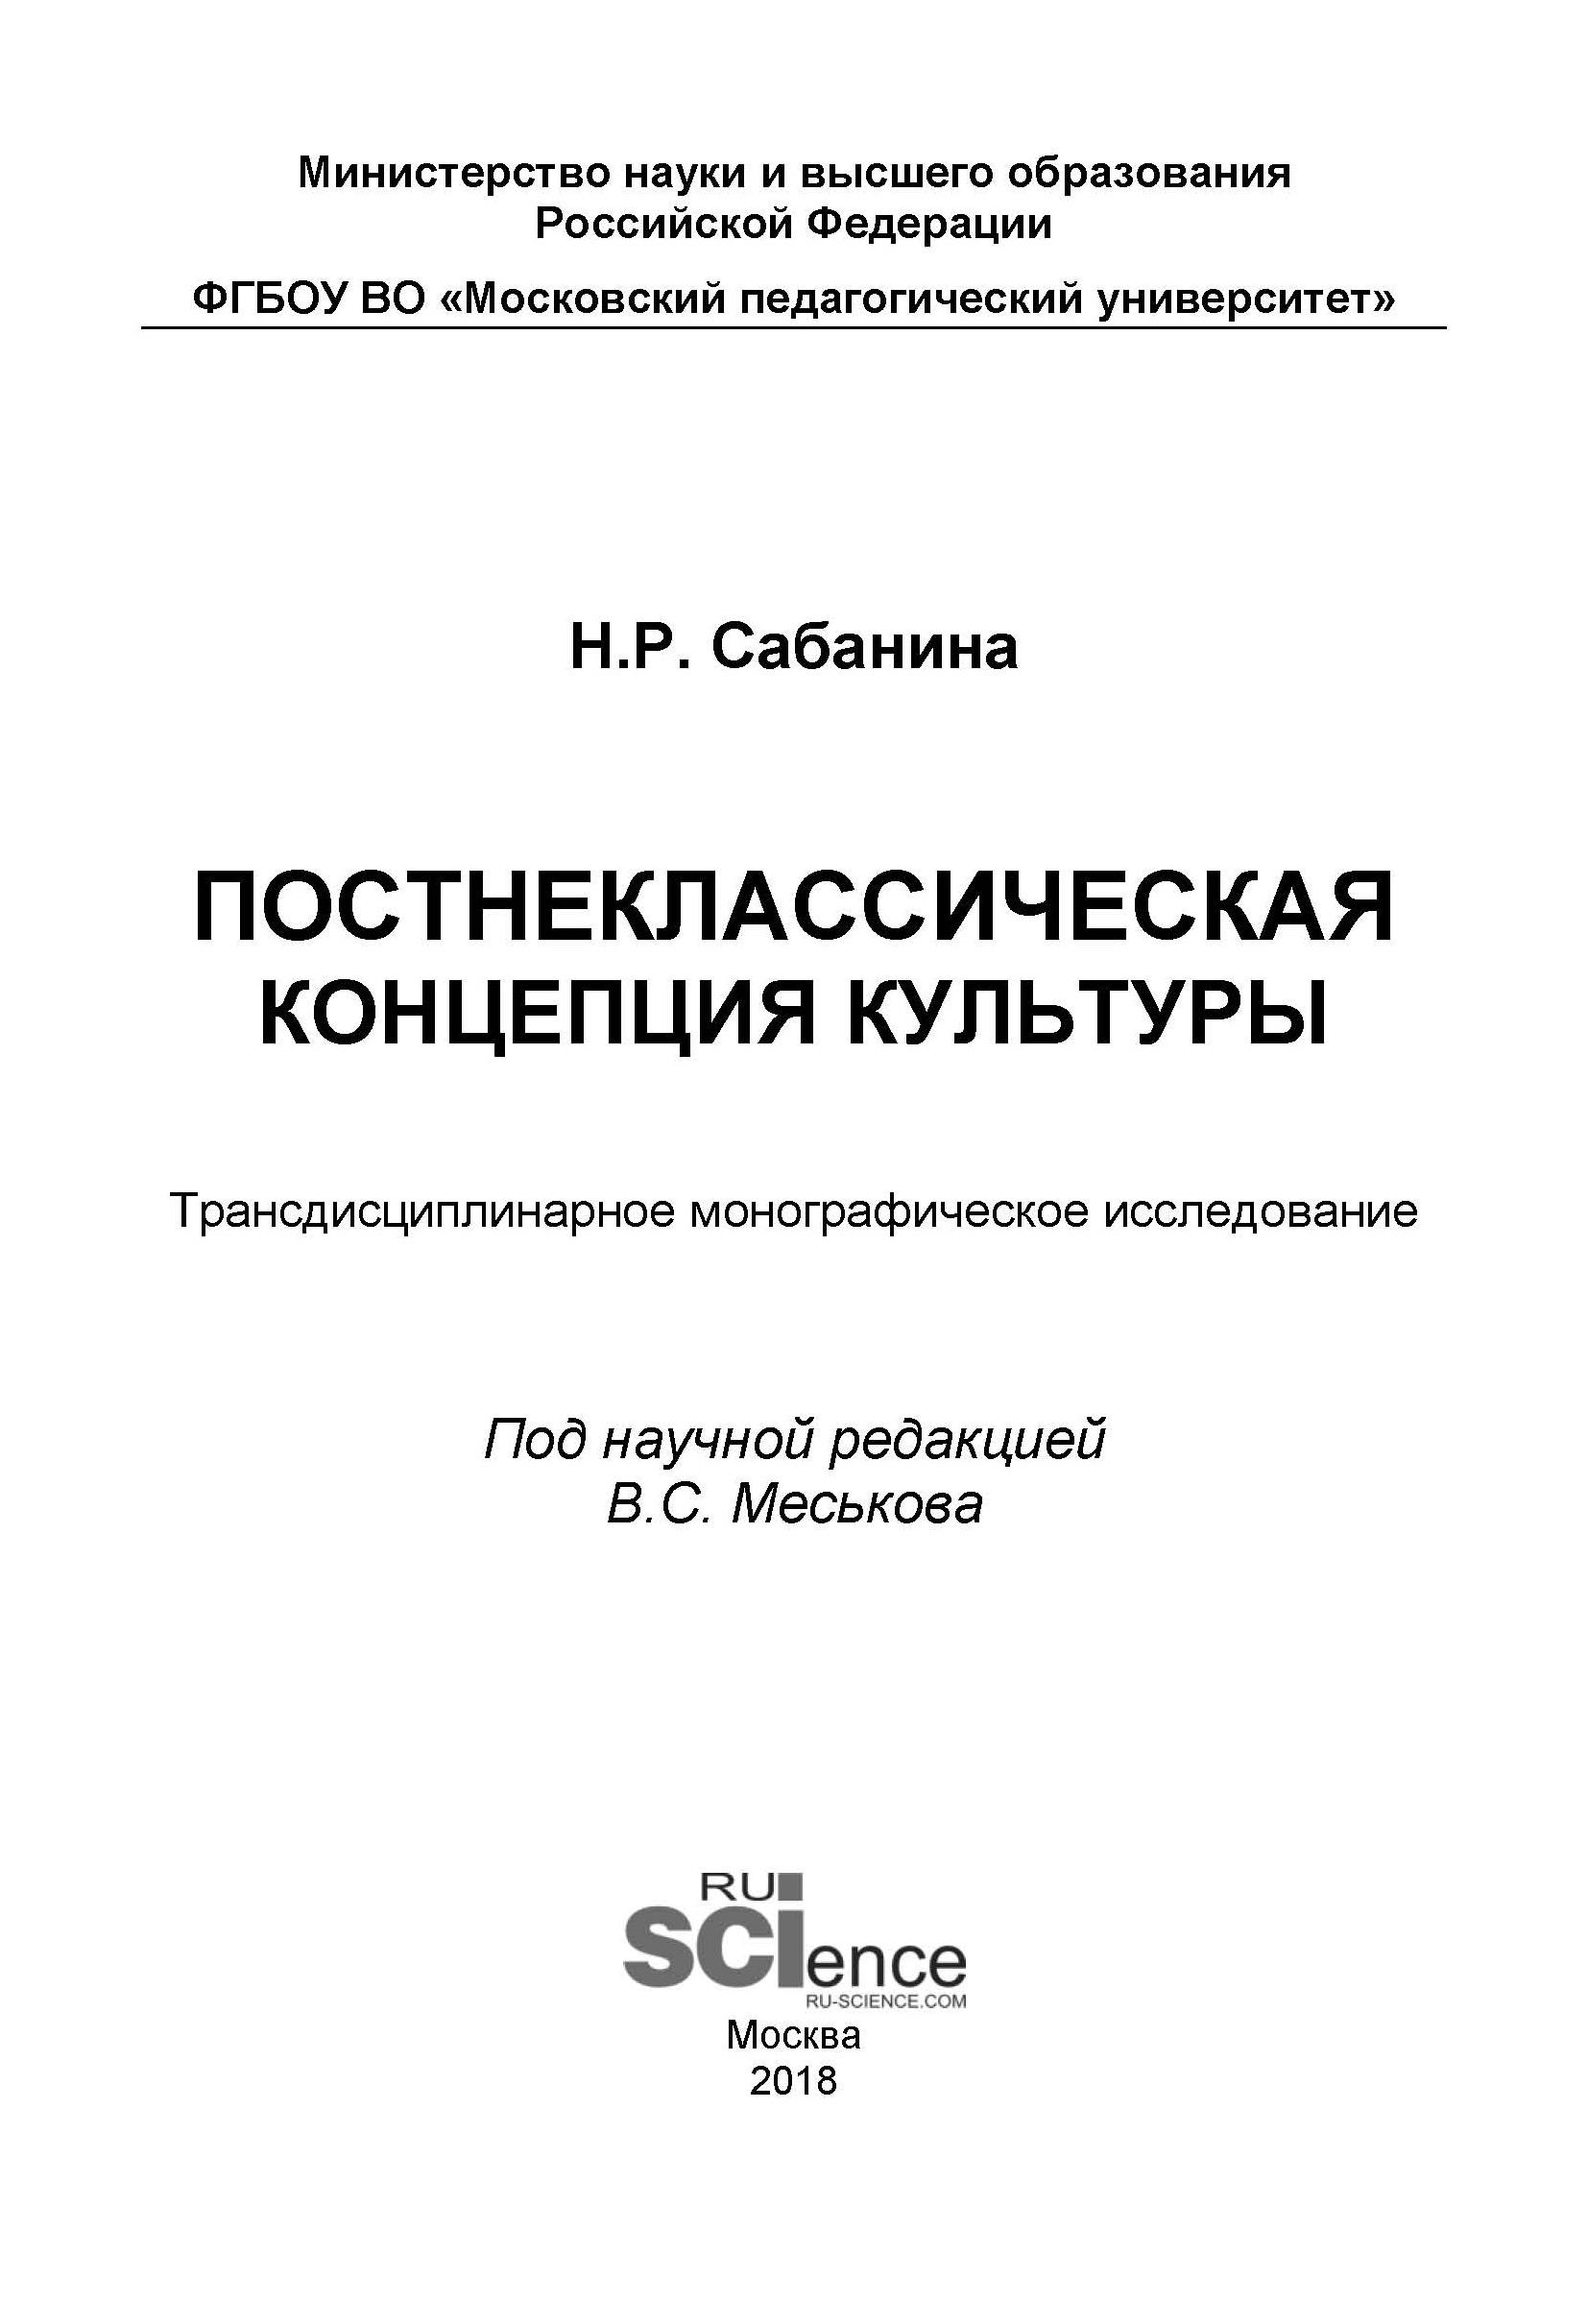 view ЕВФРАТ-Документооборот.